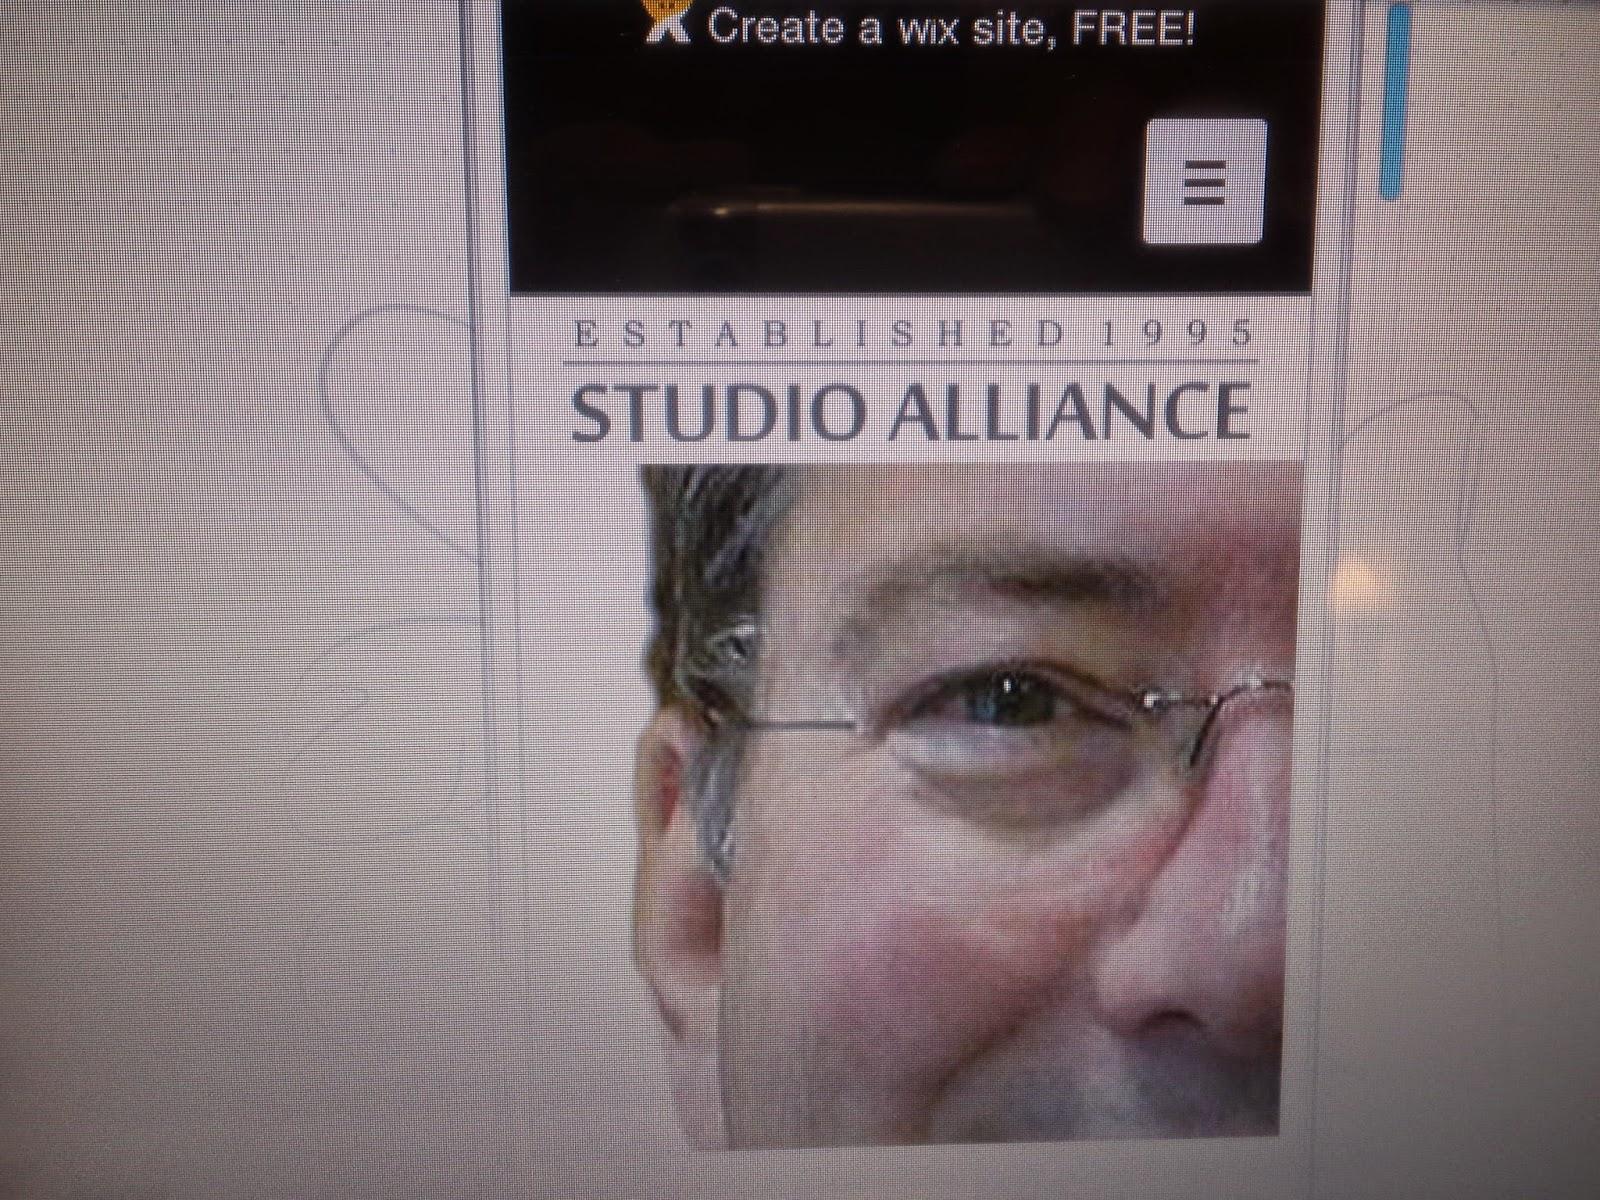 http://studioalliance5.wix.com/intro